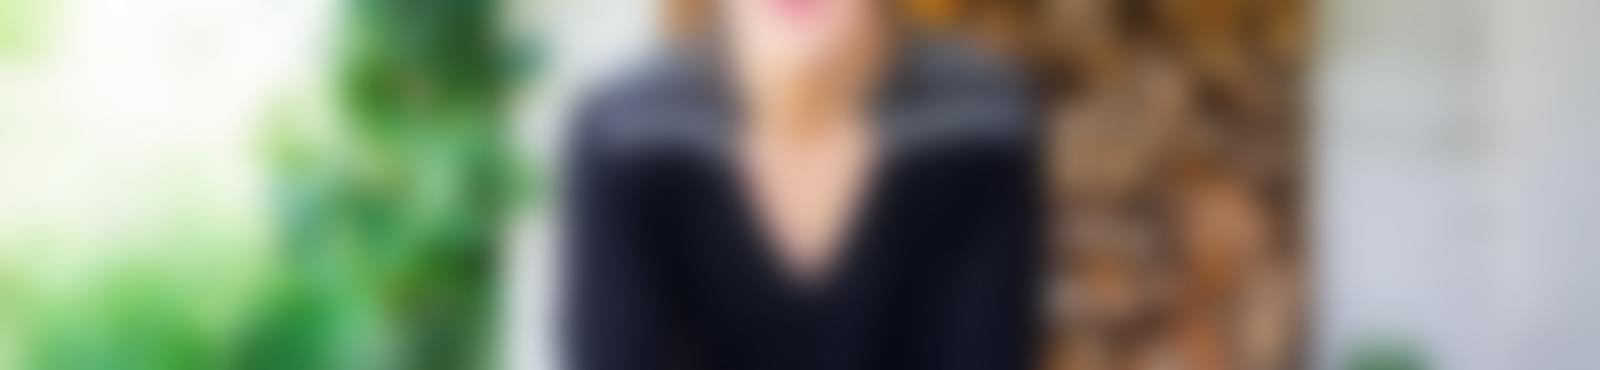 Blurred fe356cc3 5c8c 4fea a21f 693adf09a2bb